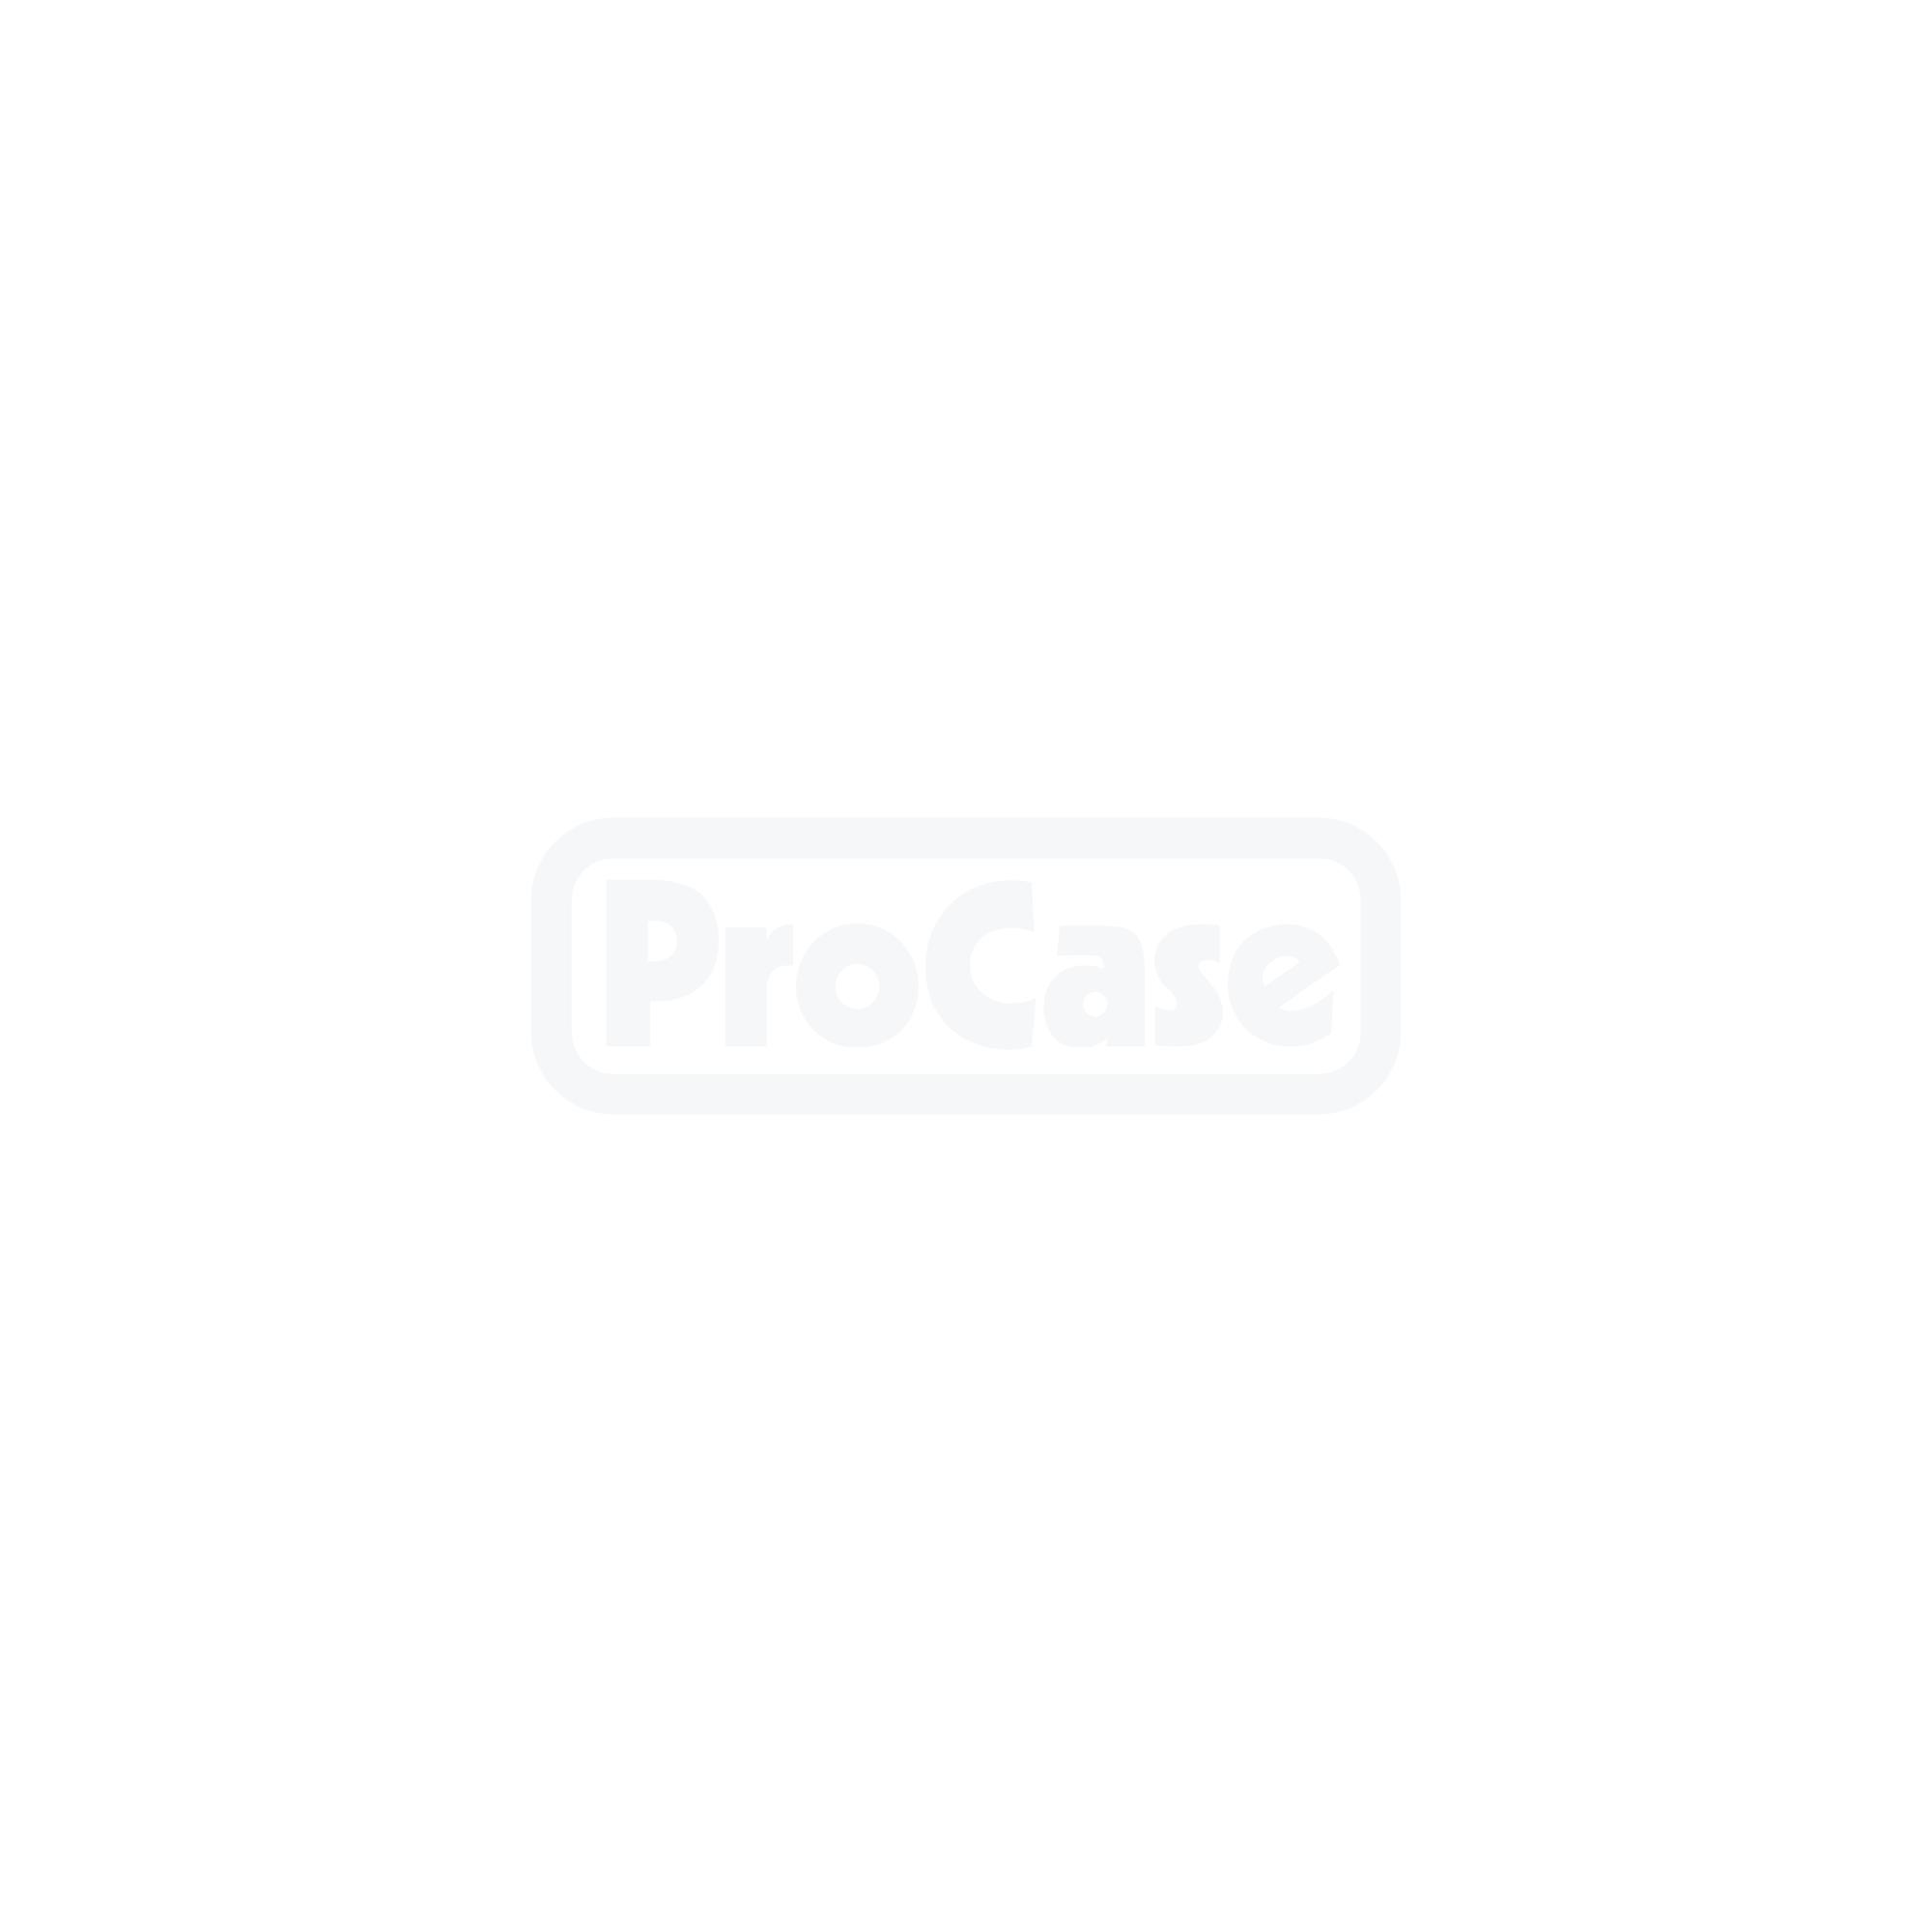 Transportkoffer für Brähler DIGIMIC 3